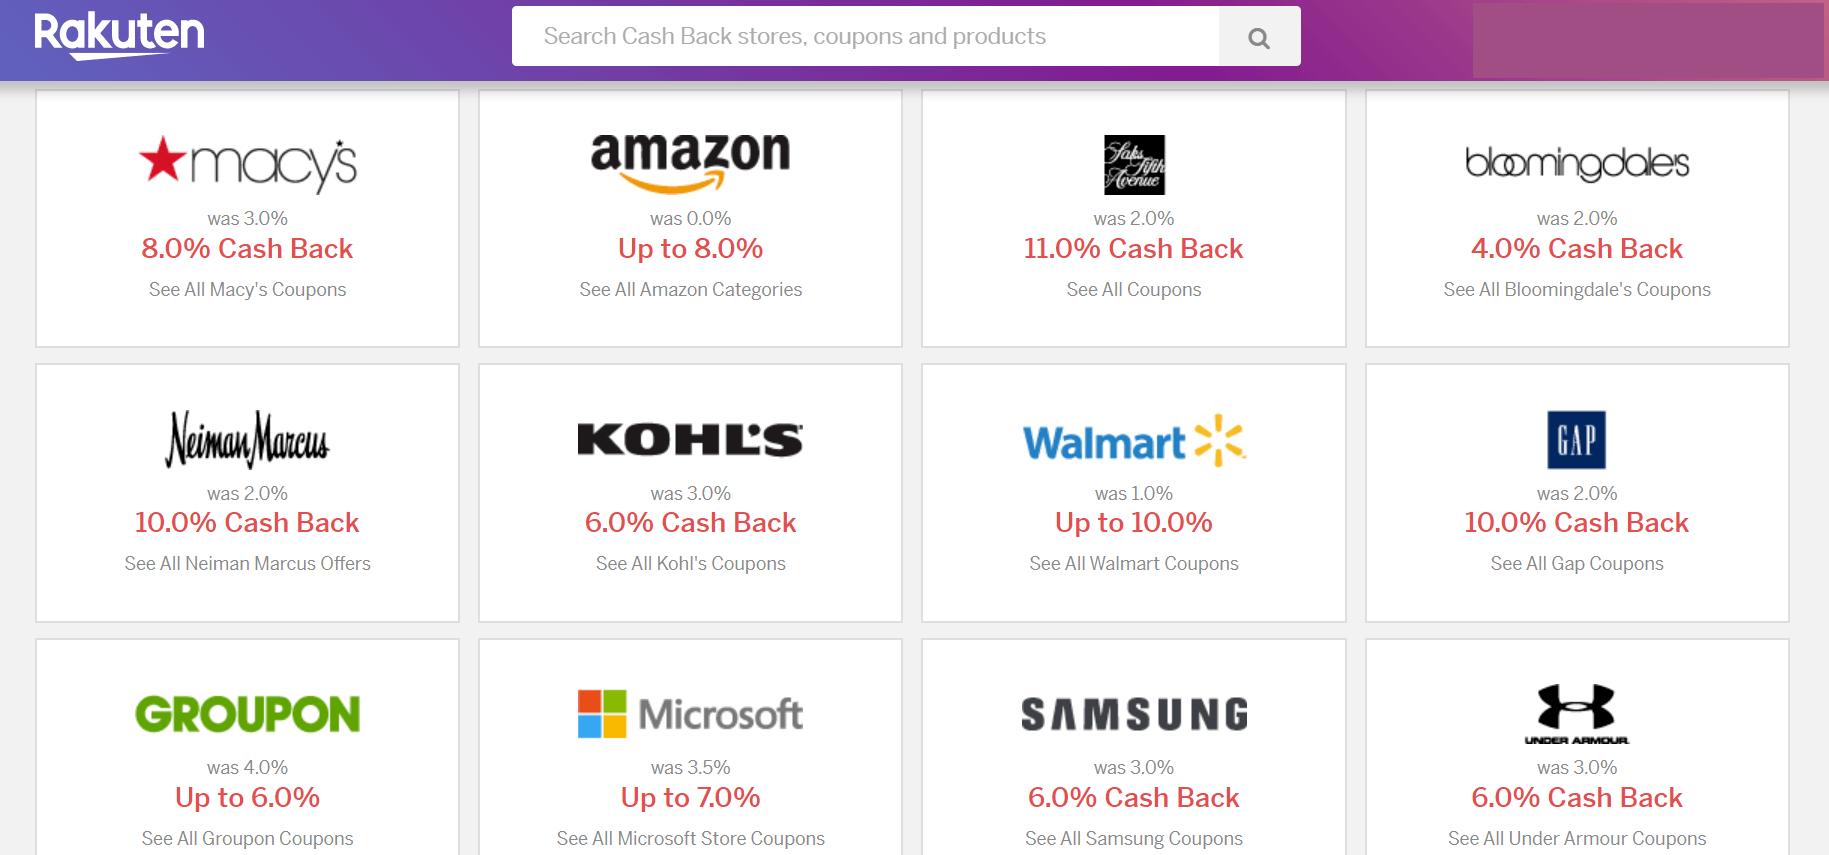 Rakuten Shopping Portal